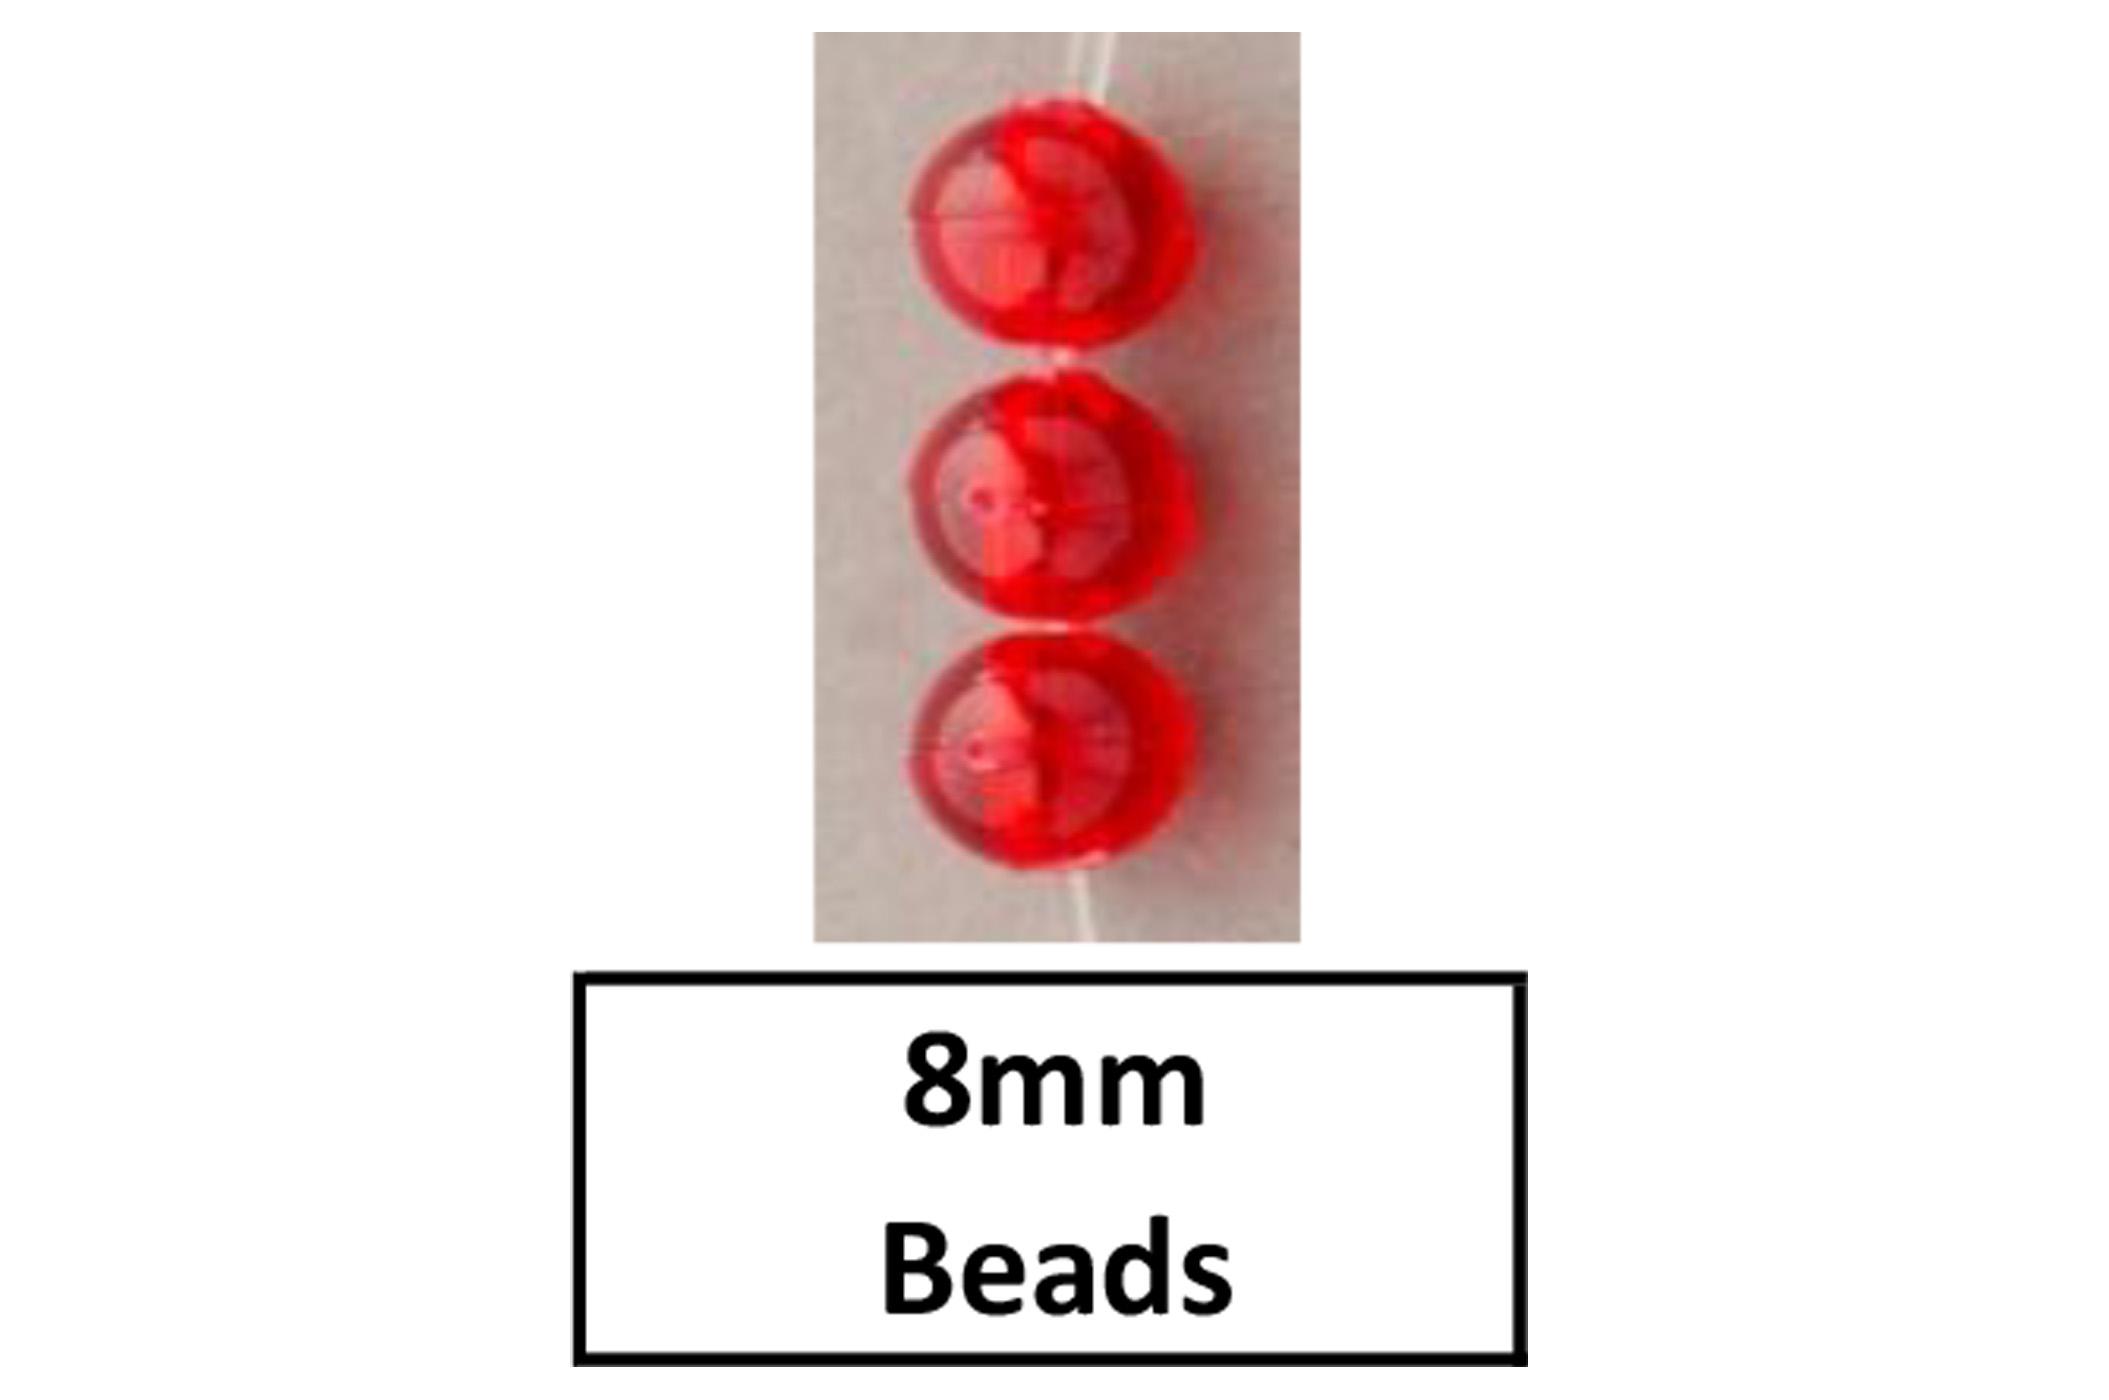 8mm bead